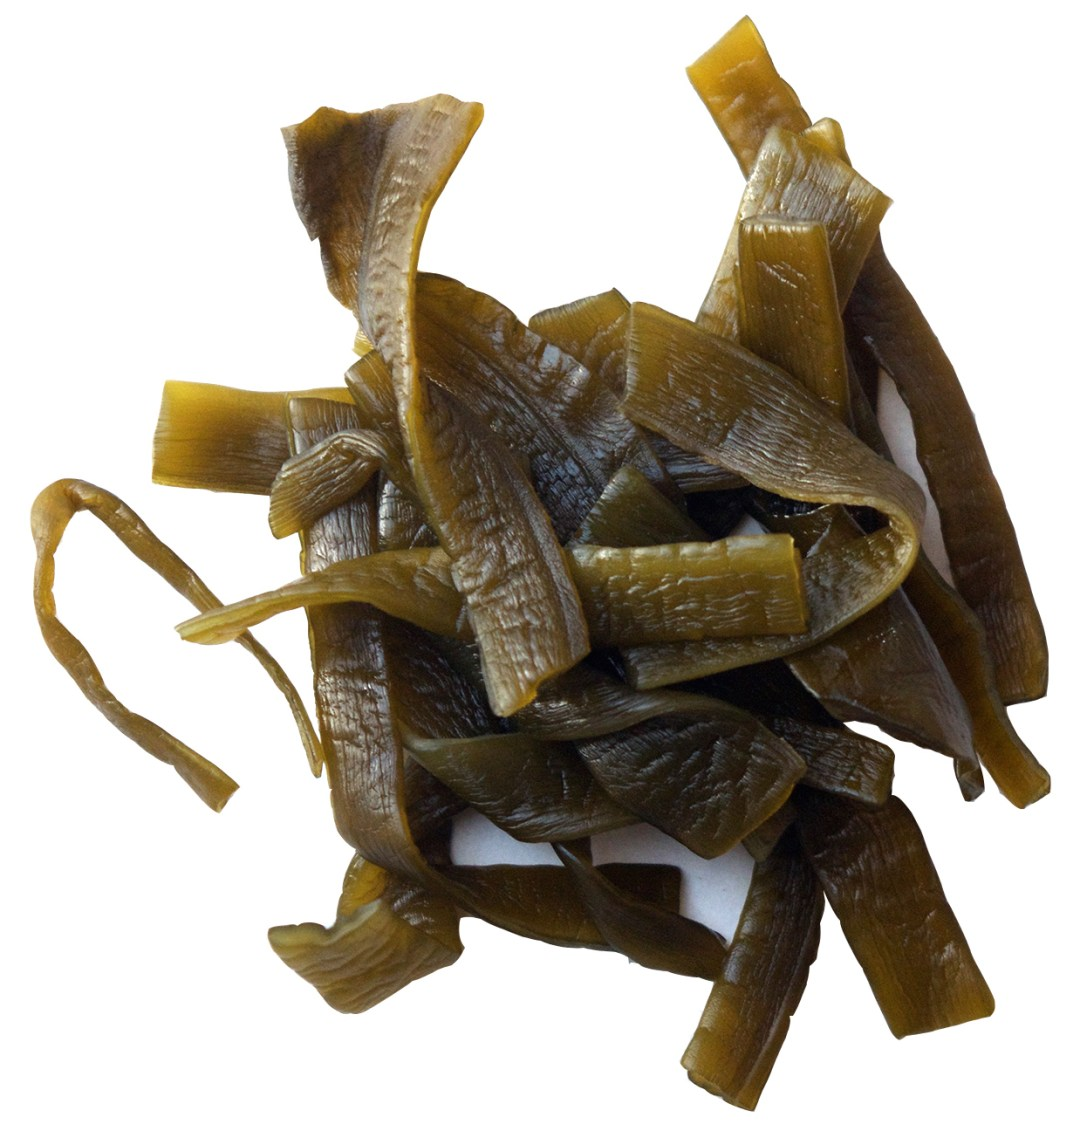 Japanese wakame snack